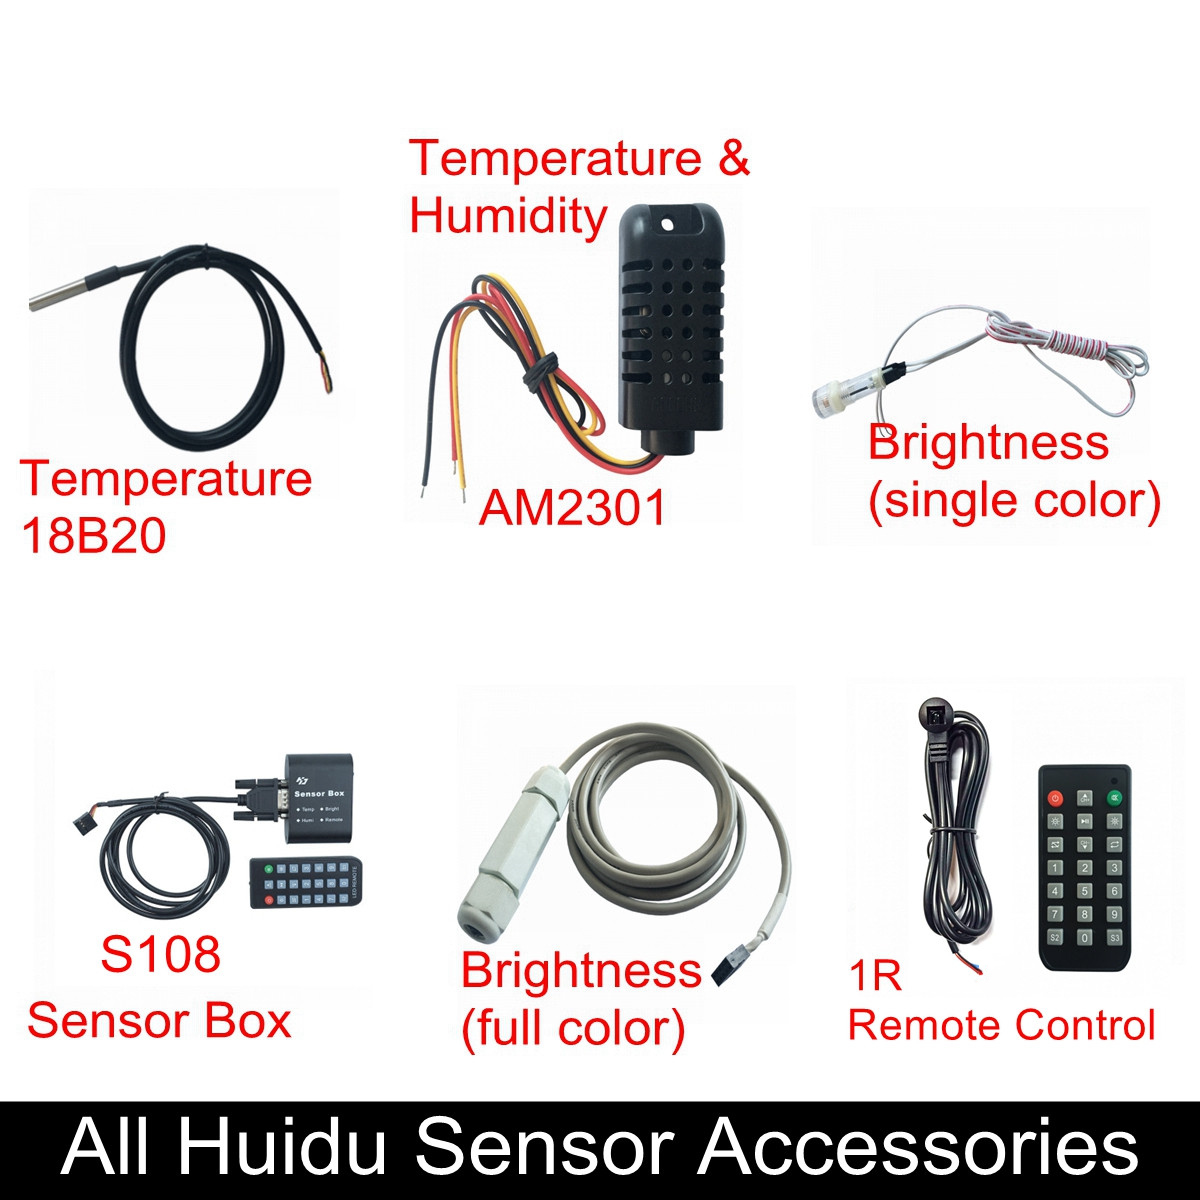 Huidu Sensors, Temperature 18B20,Temperature & Humidity Sensor AM2301,single/RGB Brightness Sensor, Sensor Box,1R Remote